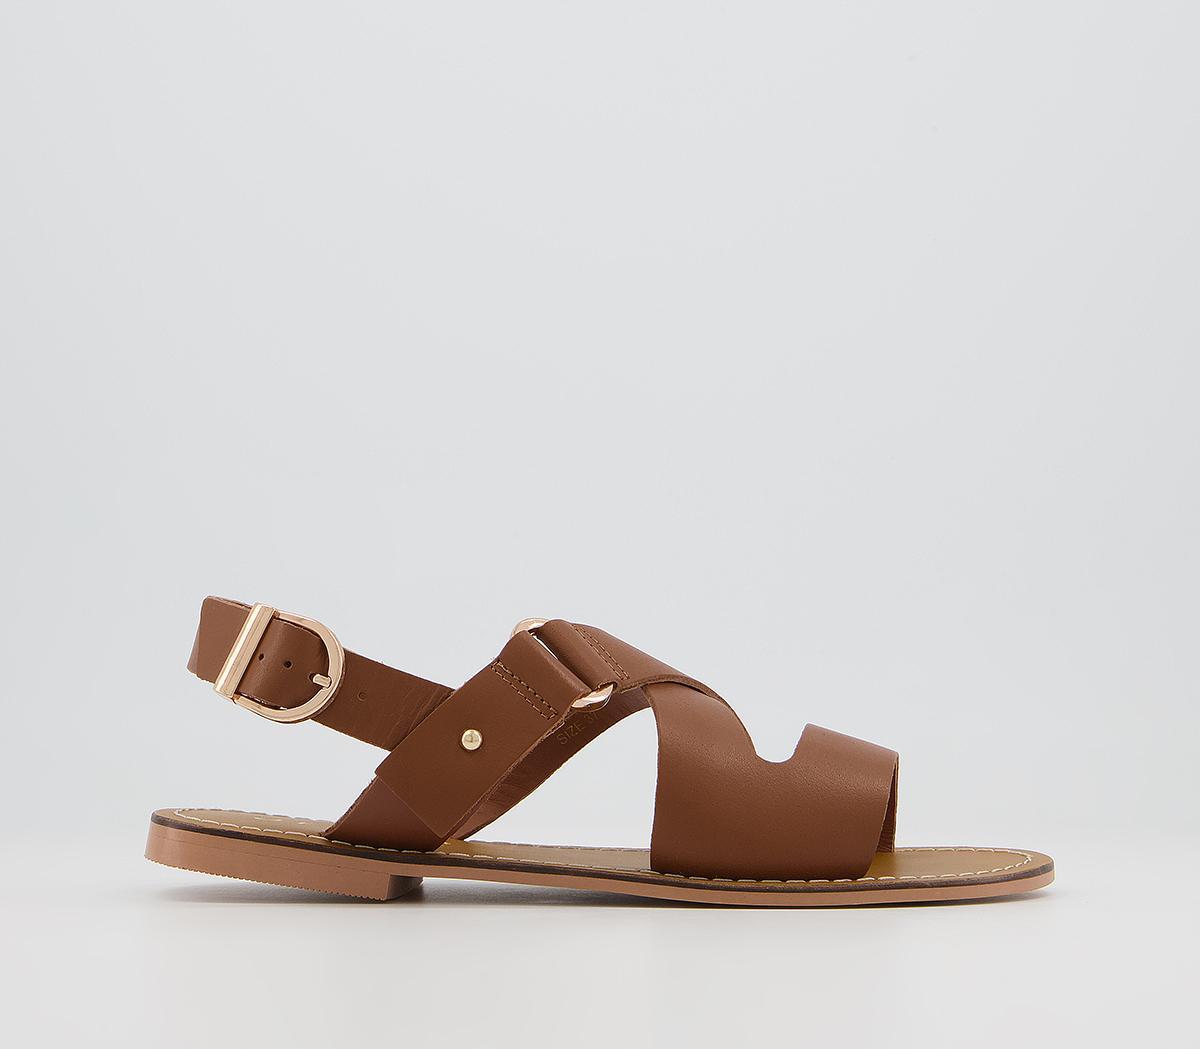 Scarlet Cross Strap Sandals